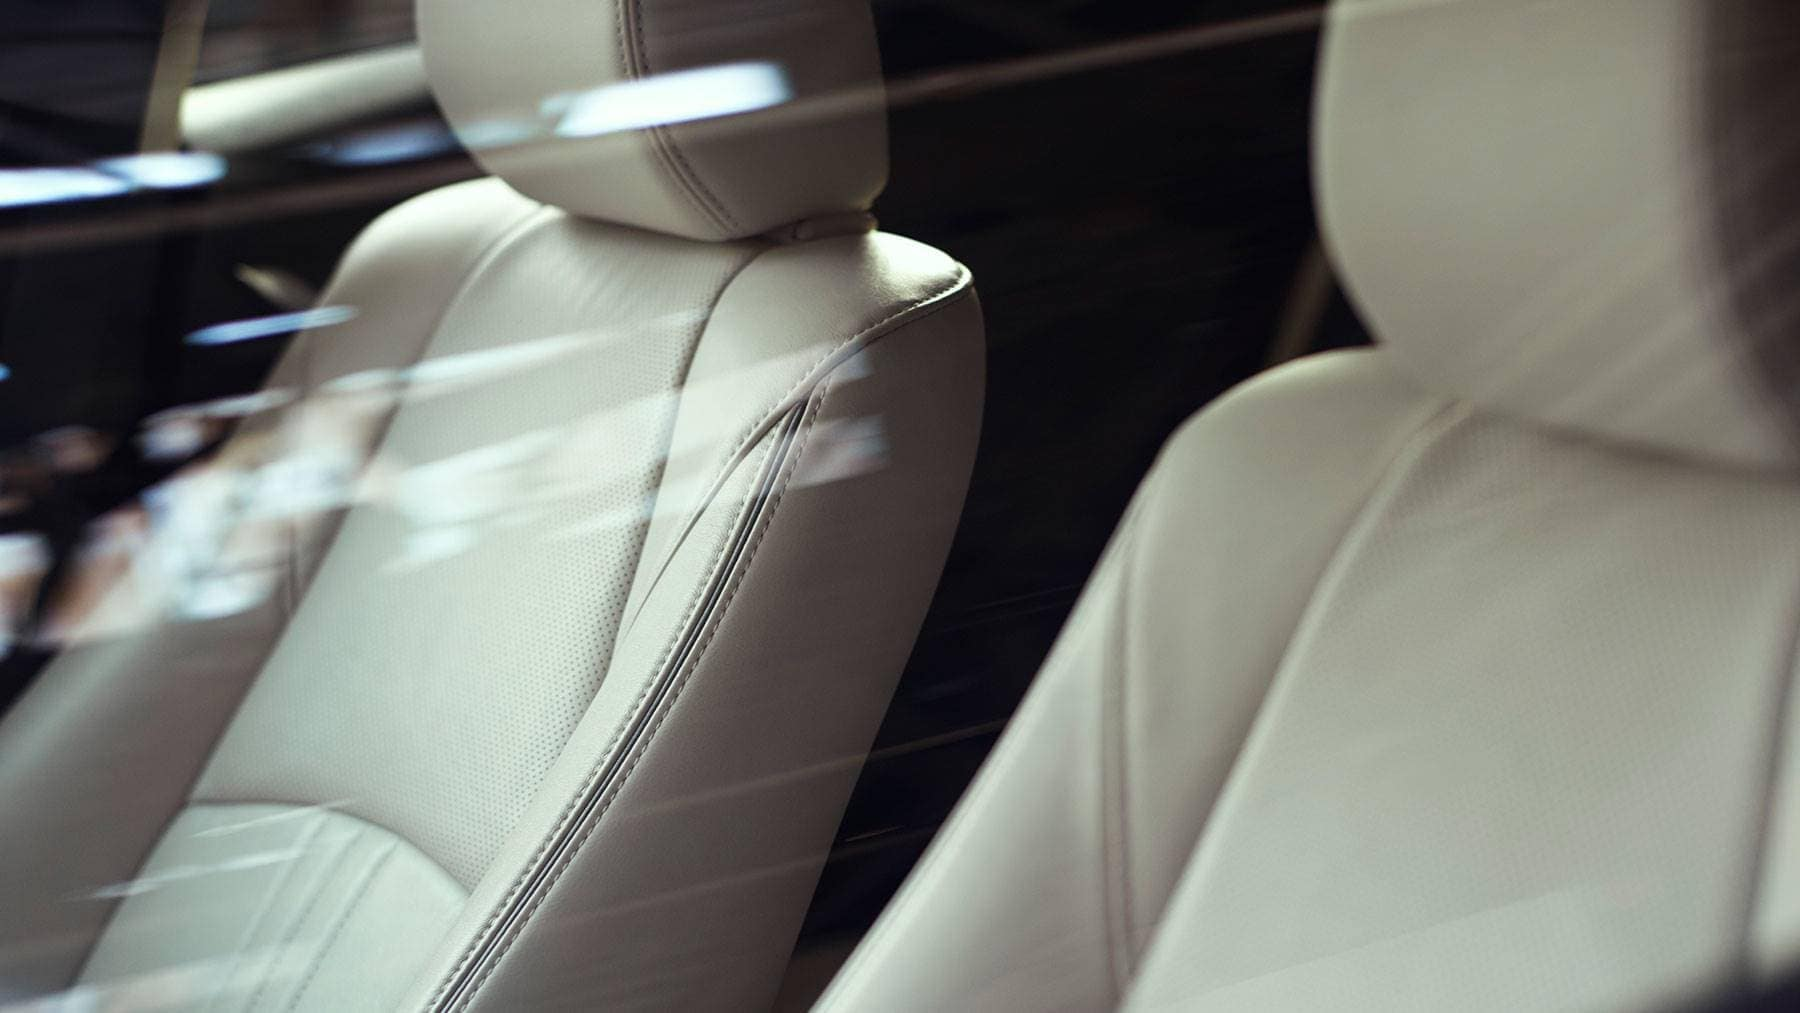 2019 Mazda CX-3 seats